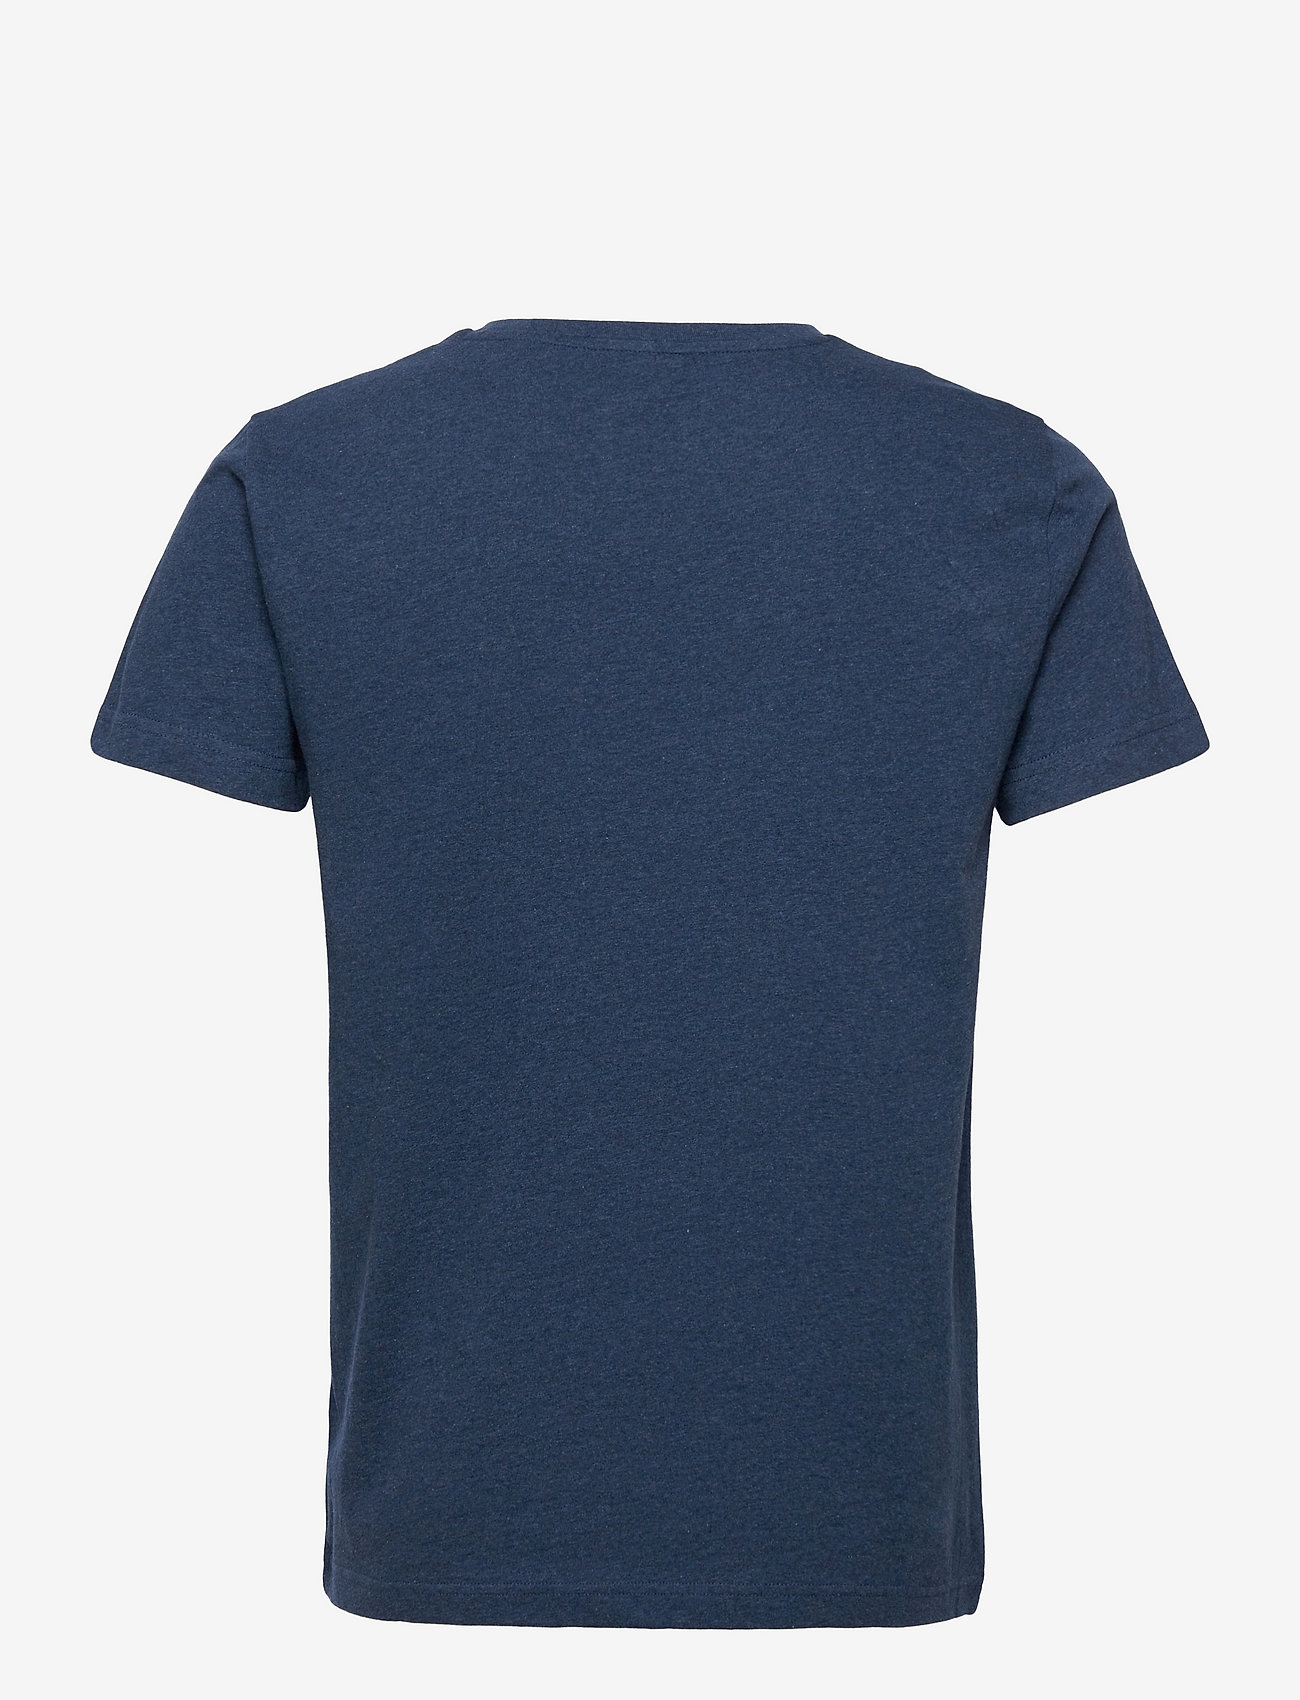 GANT - MD. FALL SS T-SHIRT - short-sleeved t-shirts - marine melange - 1